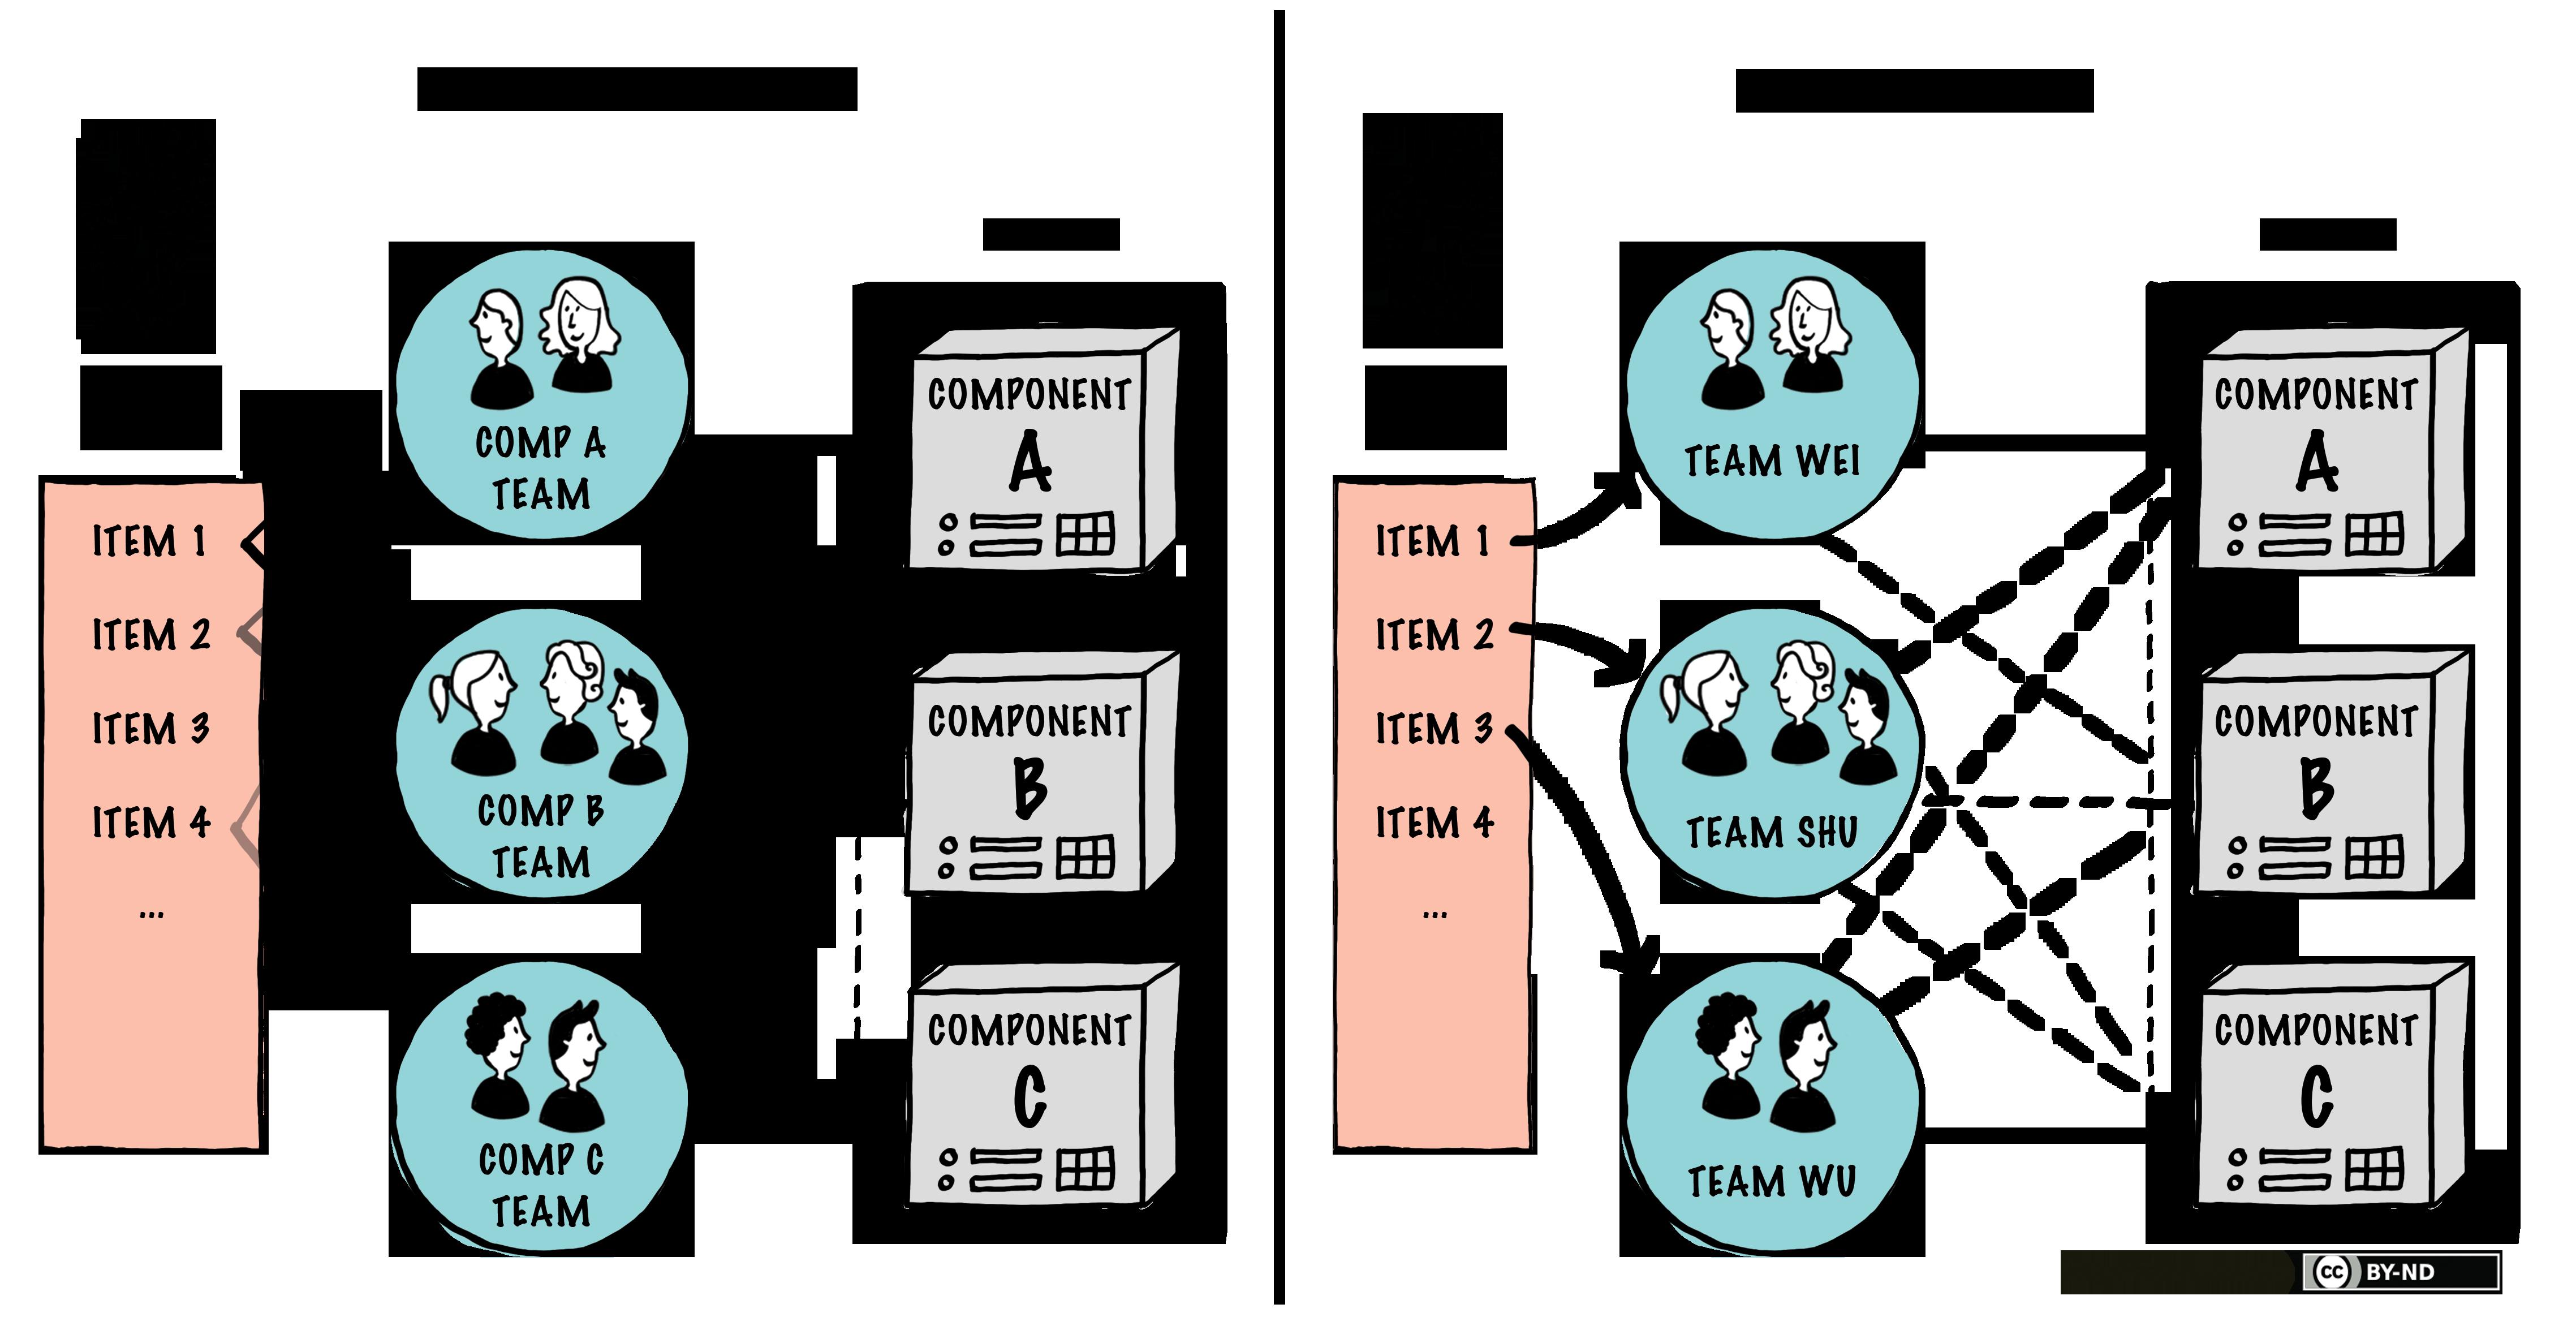 Feature Team vs Component Team